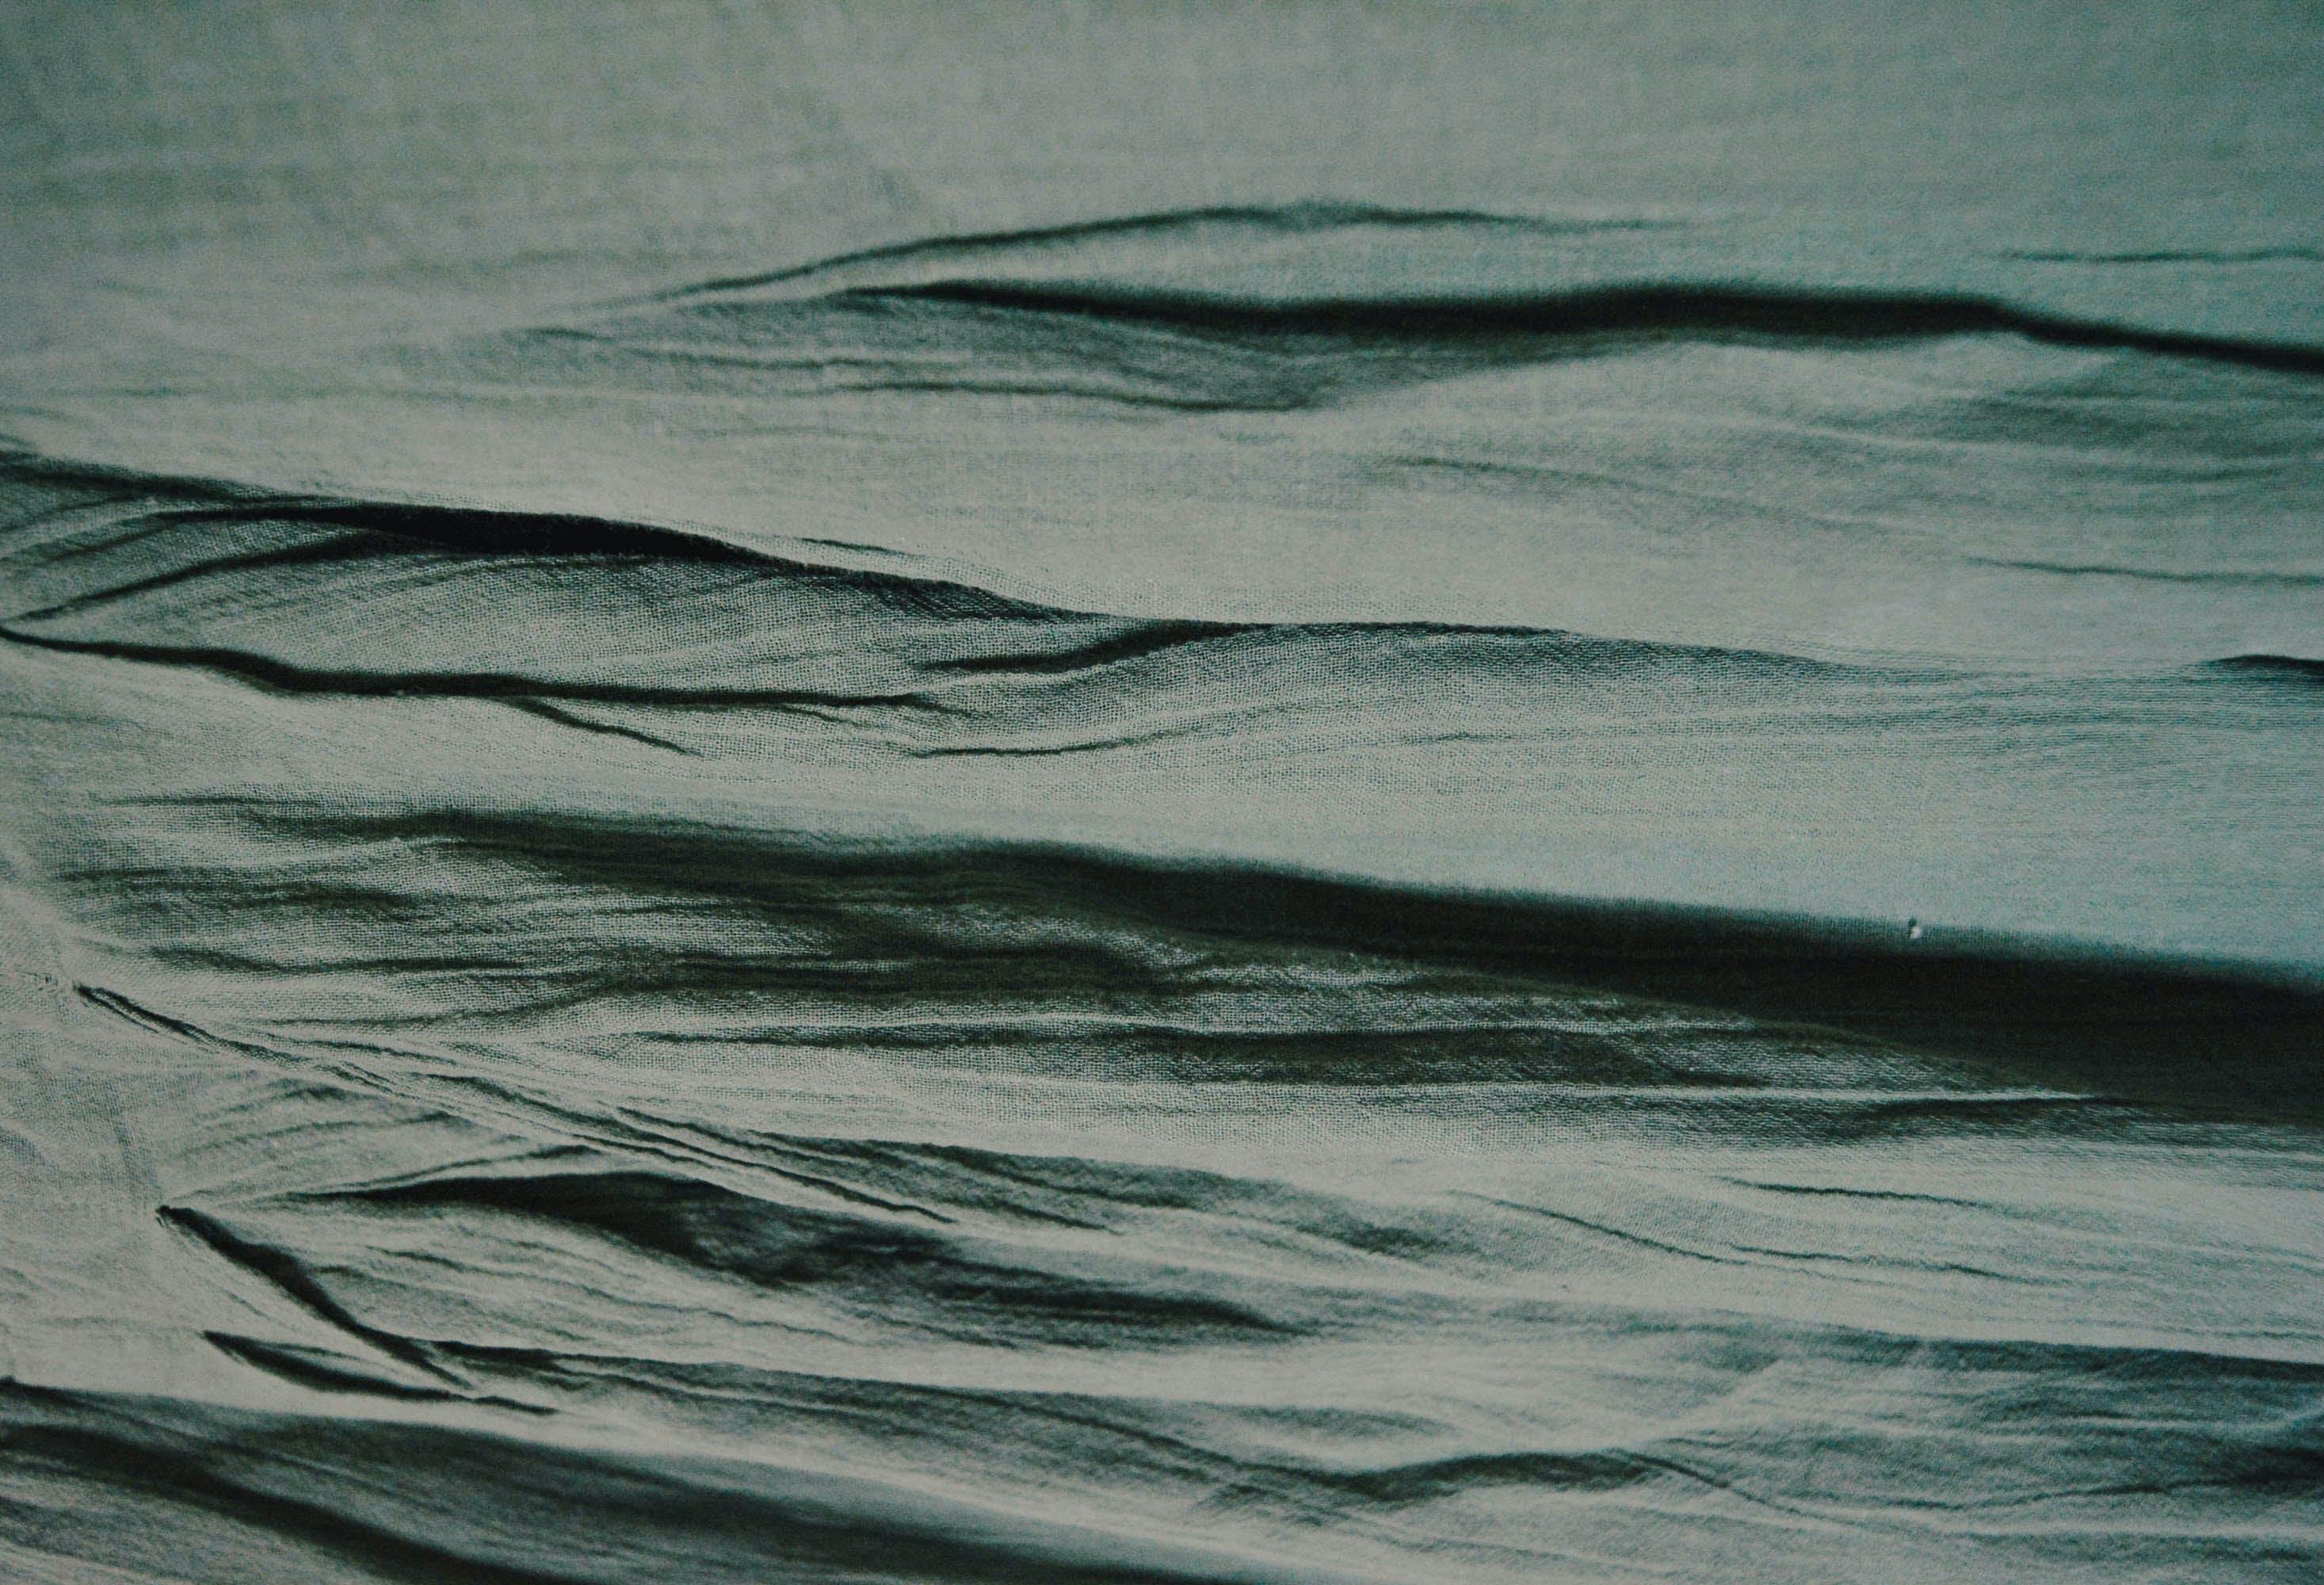 Free stock photo of dress, pattern, shape, texture